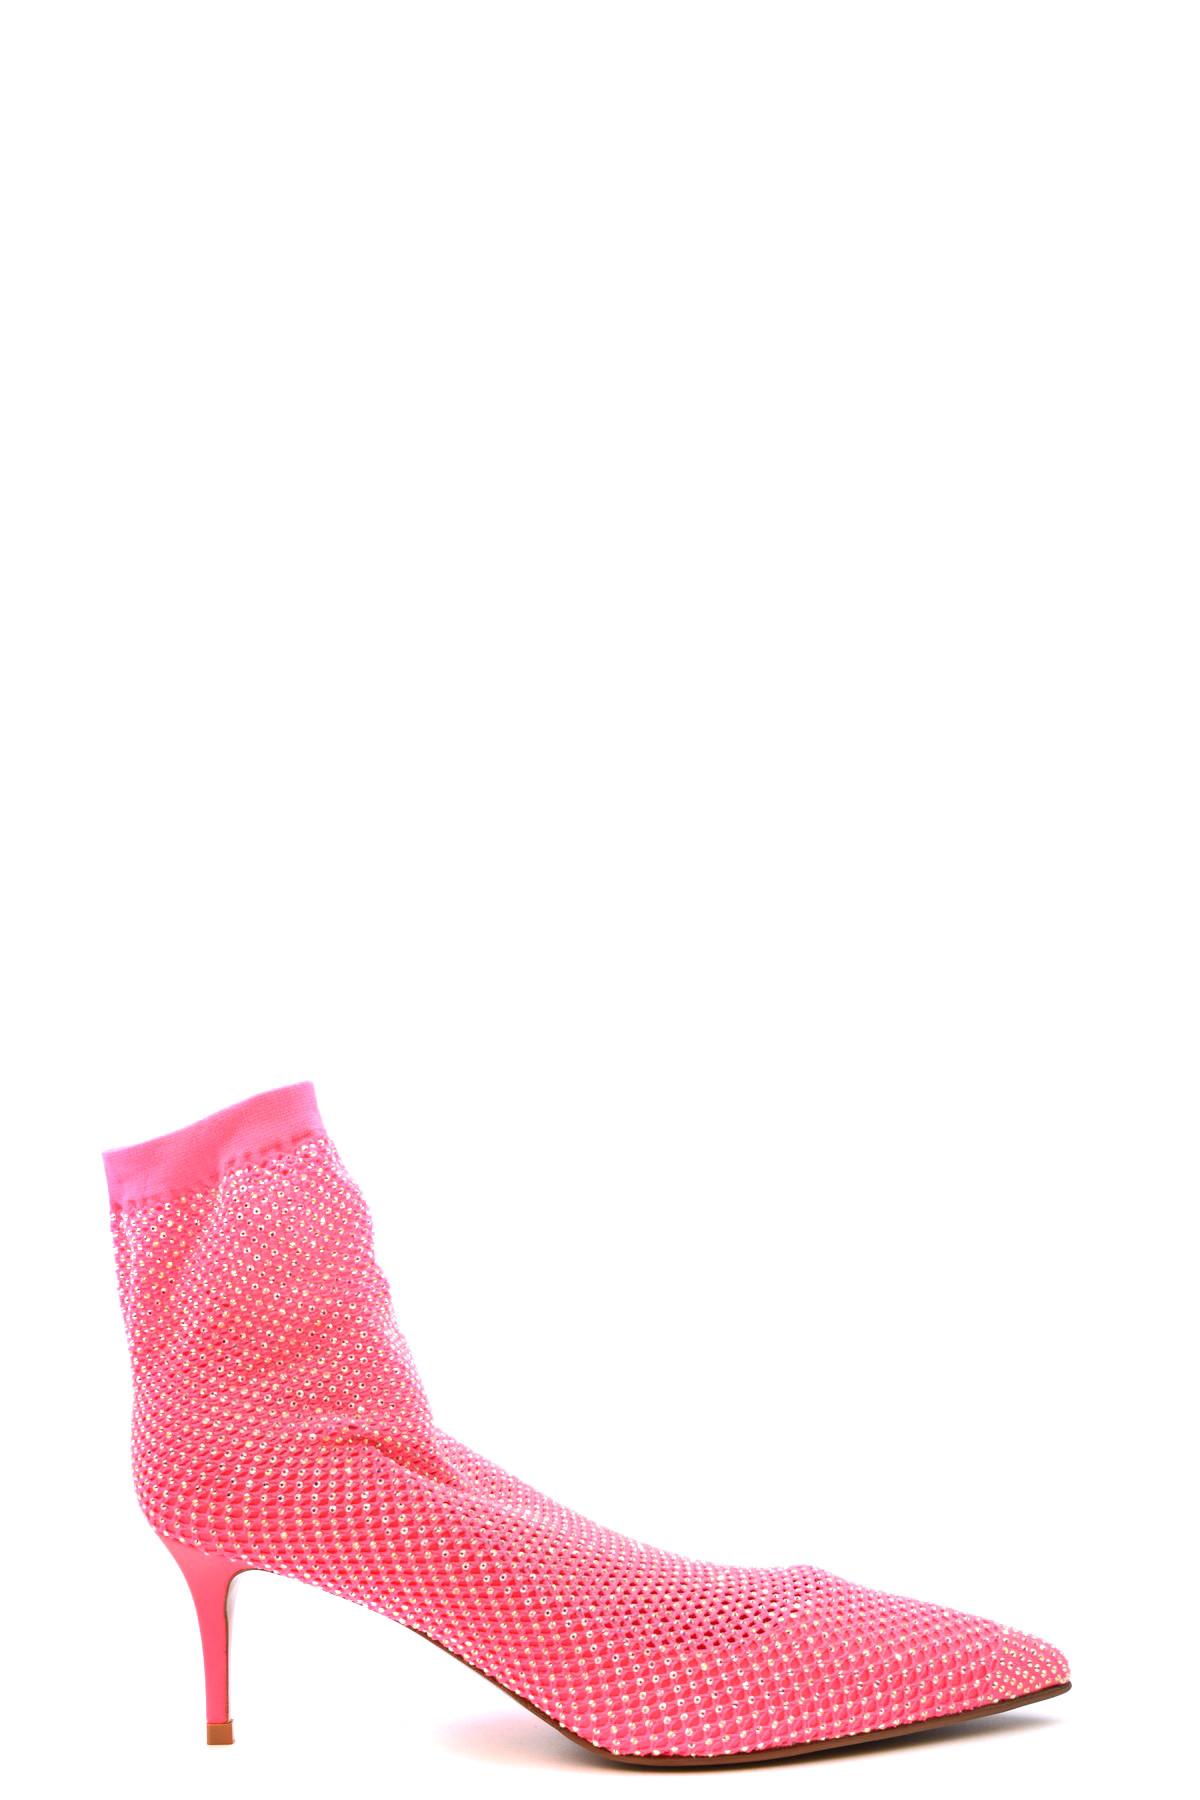 Le Silla Scarpe Décolleté Ženy